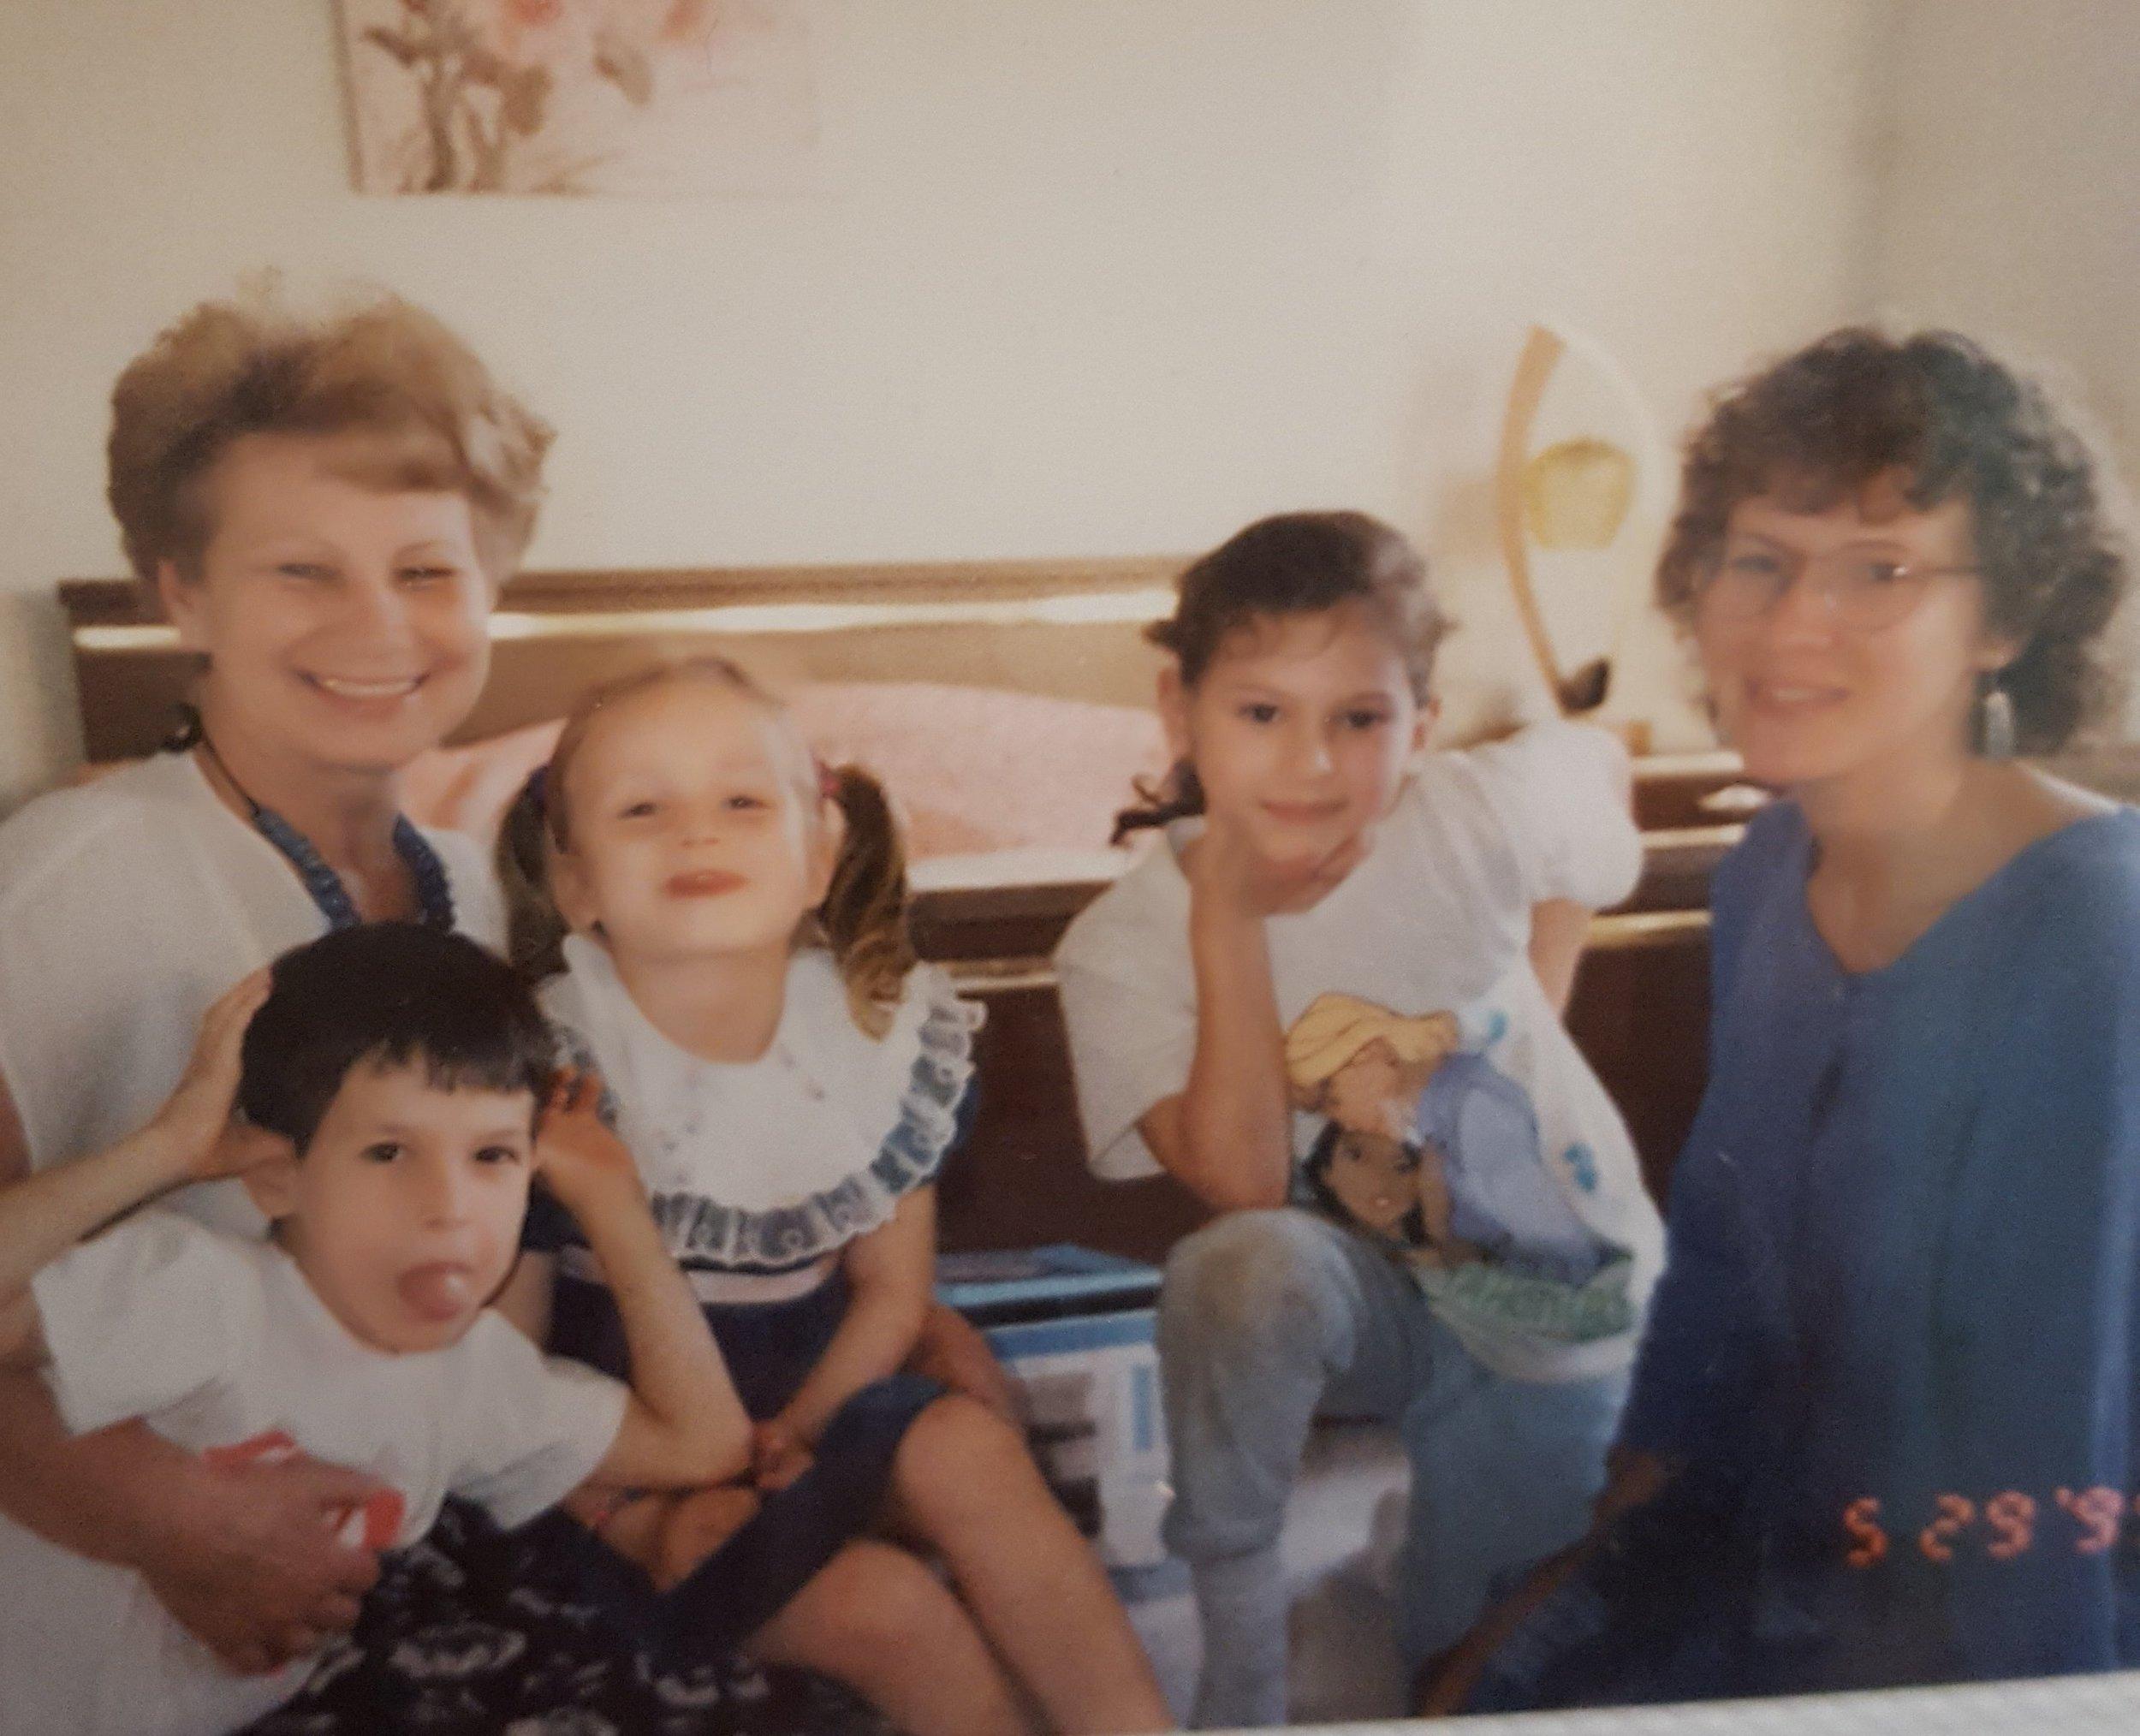 Rimma, Mark, Lina, Anna (Acya), and I in Chicago, 1995.